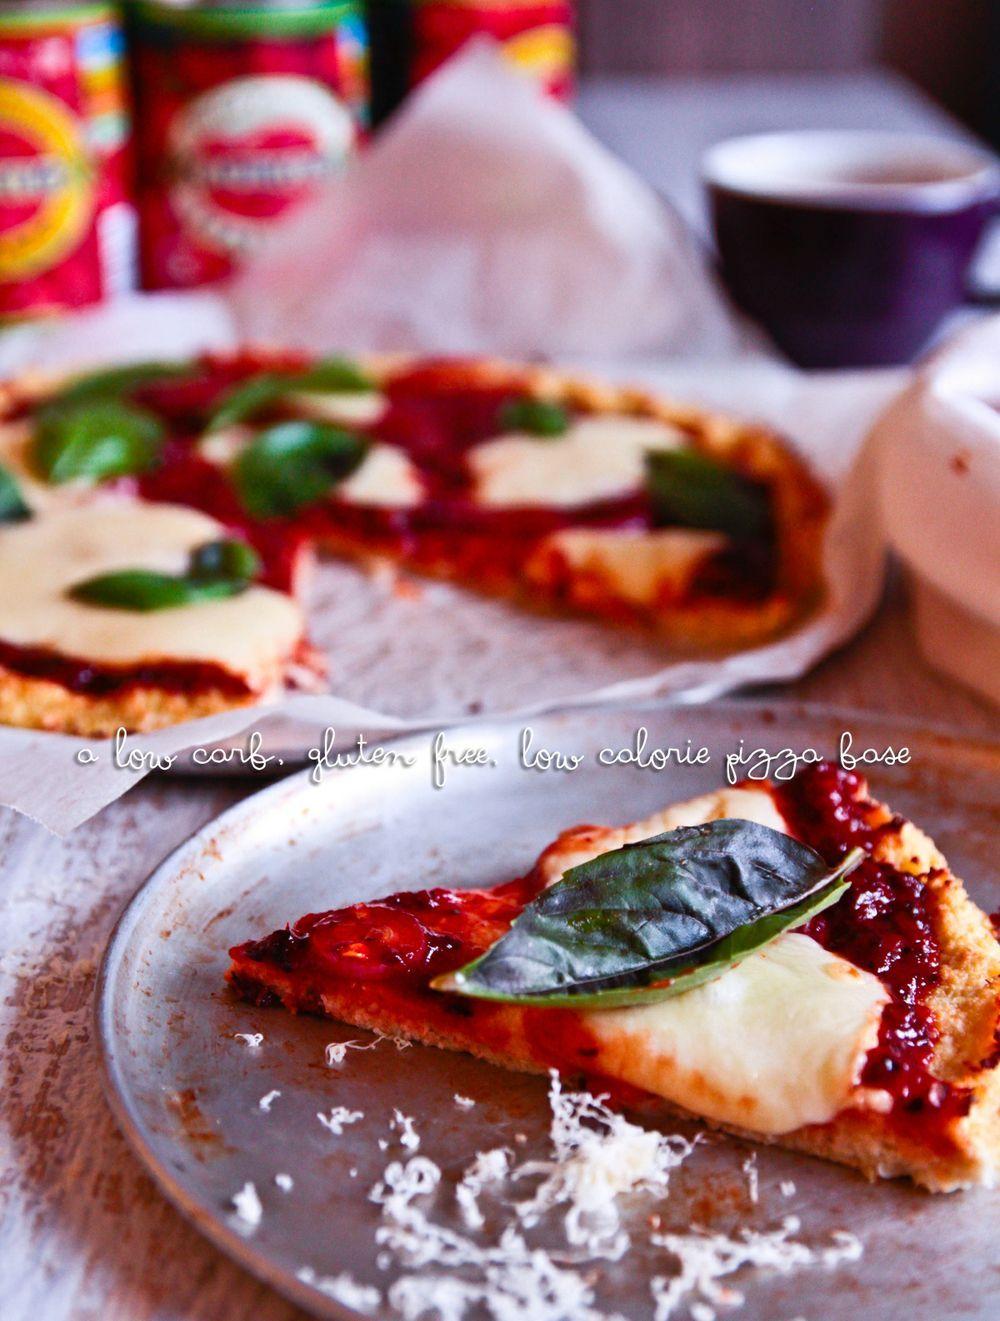 Low carb gluten free cauliflower base pizza raw food